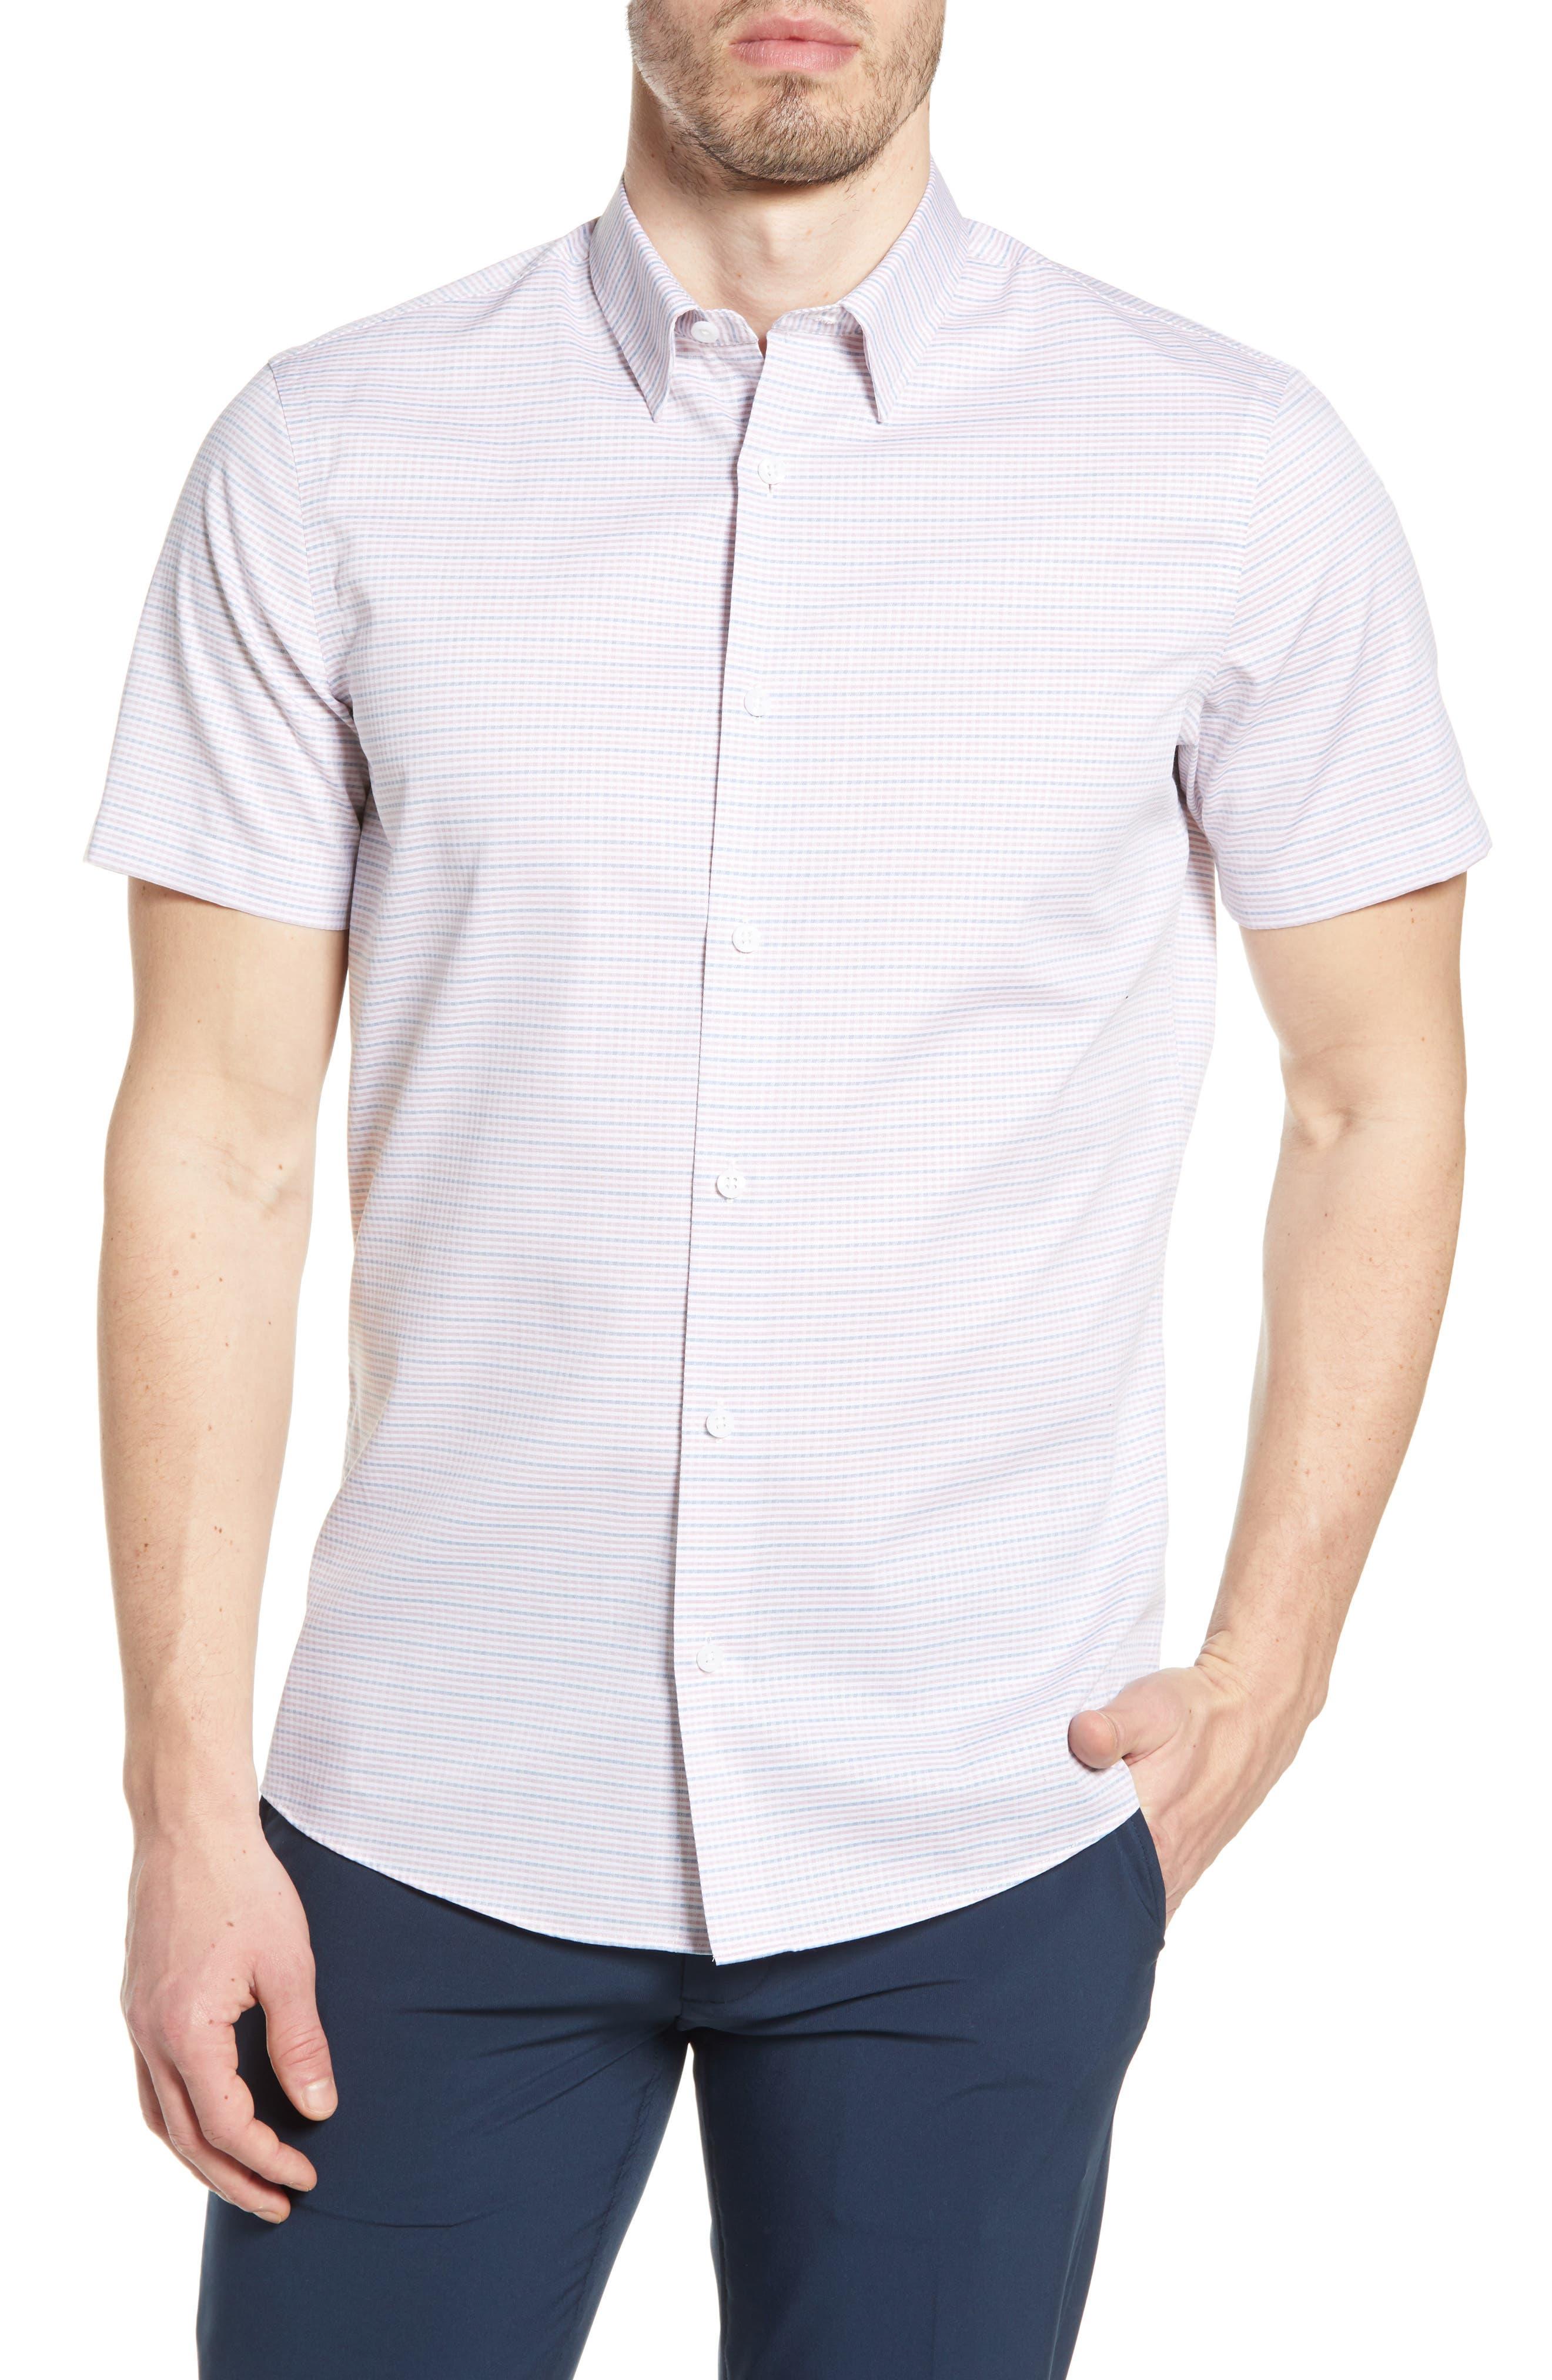 Image of NORDSTROM MEN'S SHOP Trim Fit Plaid Short Sleeve Button-Up Shirt